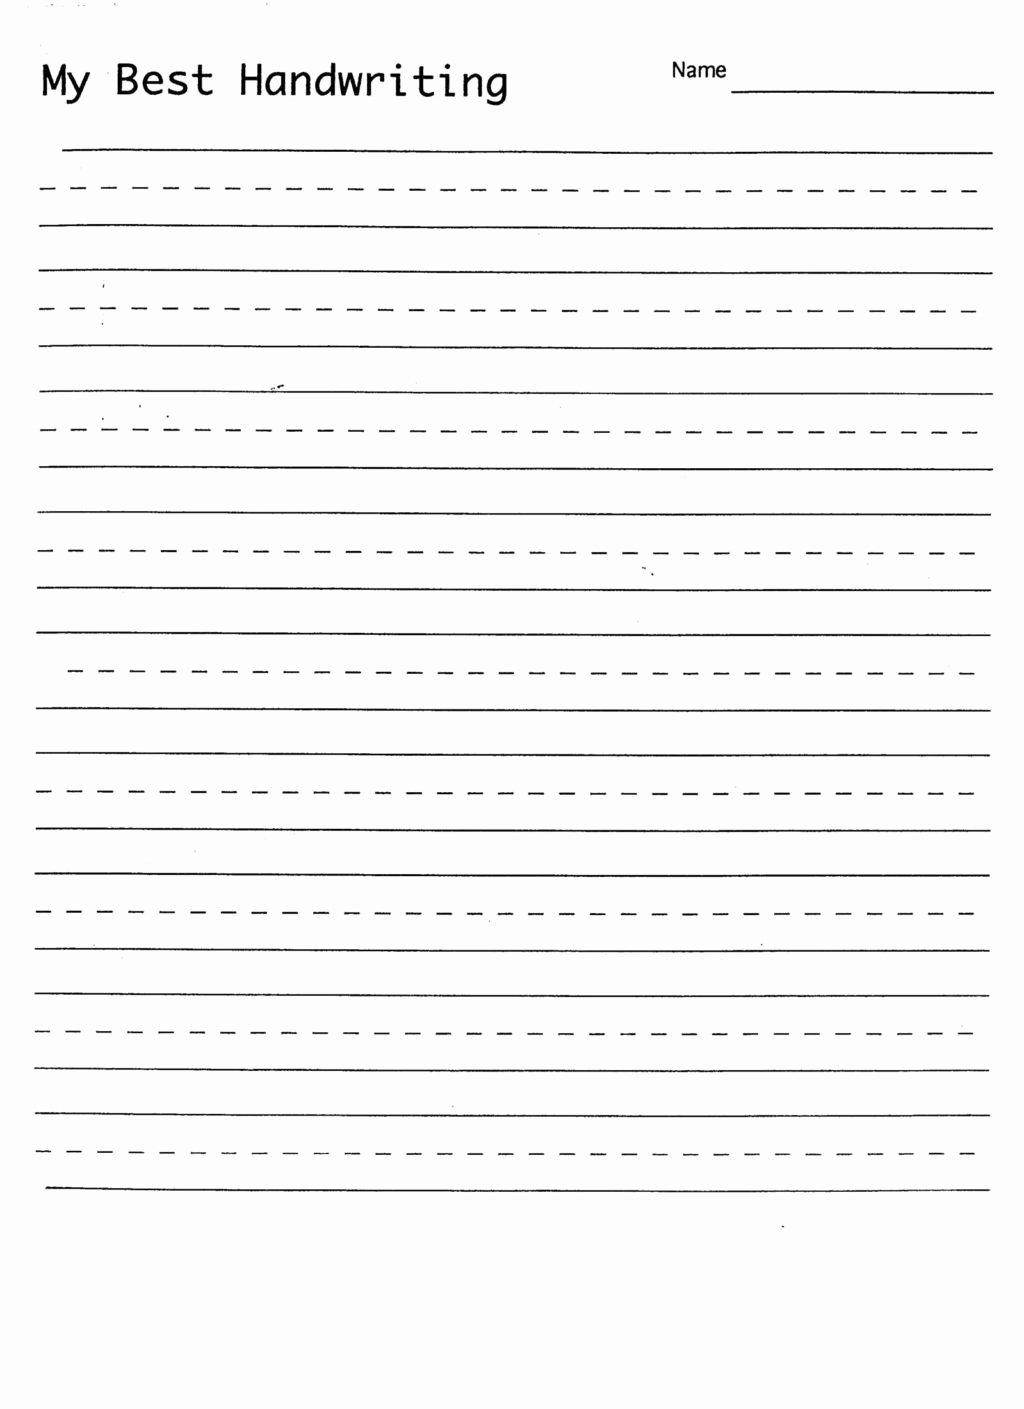 Name Writing Worksheets For Preschoolers